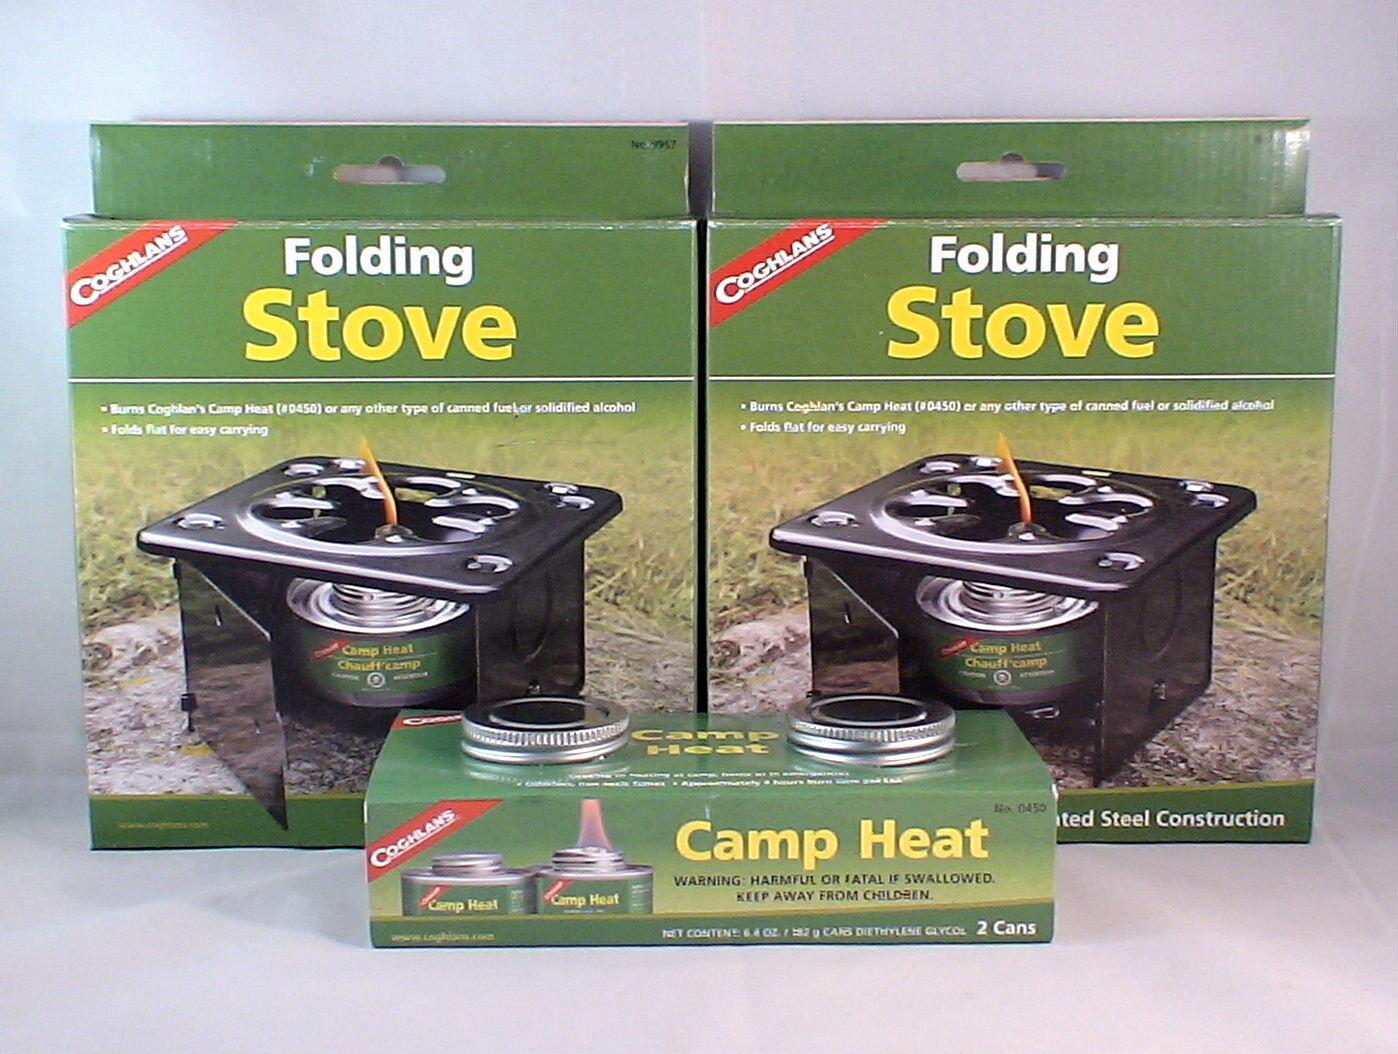 2 FOLDING EMERGENCY STOVE W 2 CANS STERNO TYPE FUEL CAMP HEAT STURDY LIGHT WARM